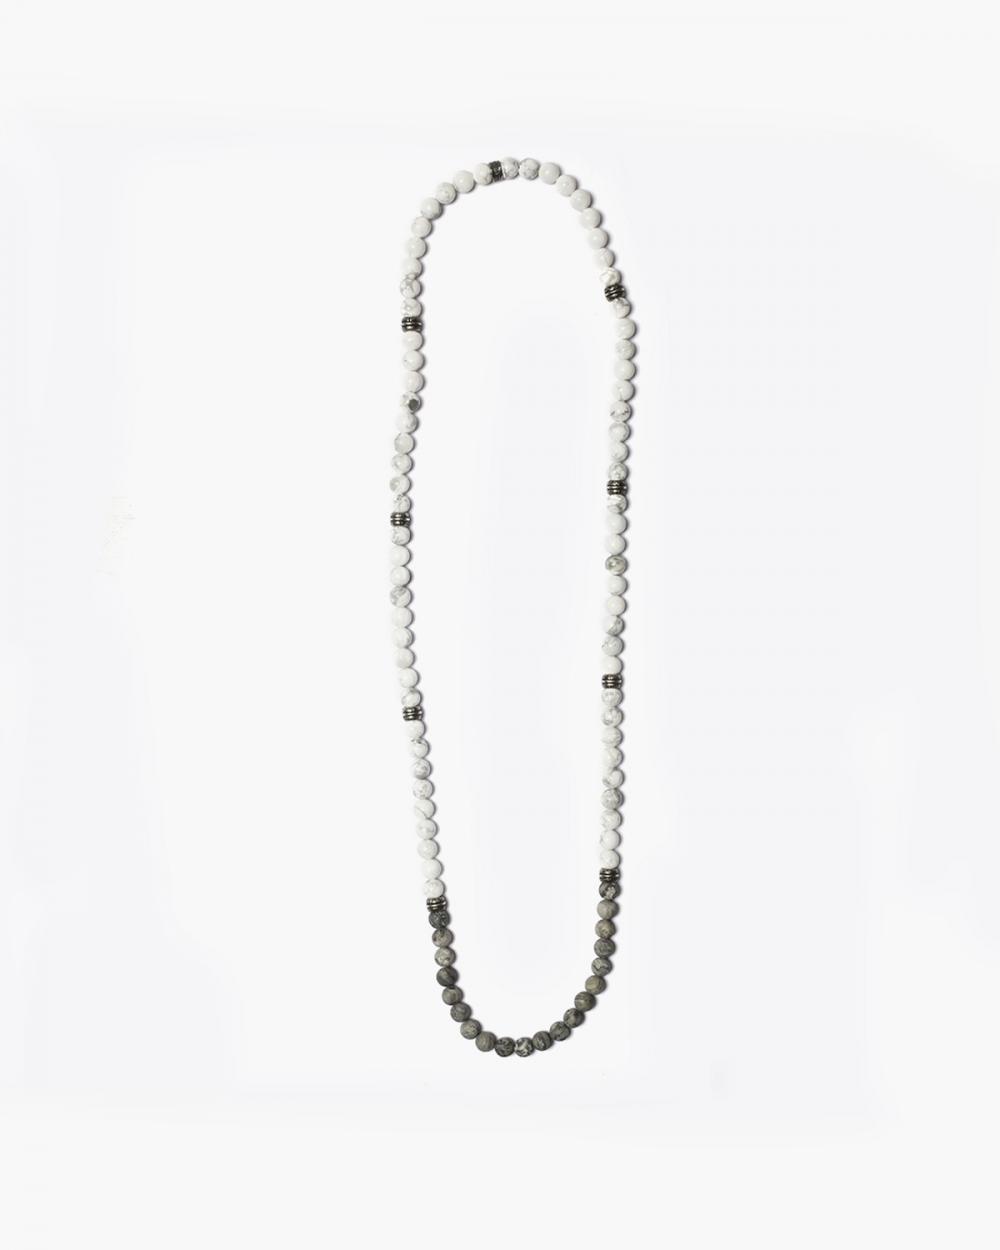 Necklaces MEDIUM WHITE & GREY STONES NECKLACE NOVE25